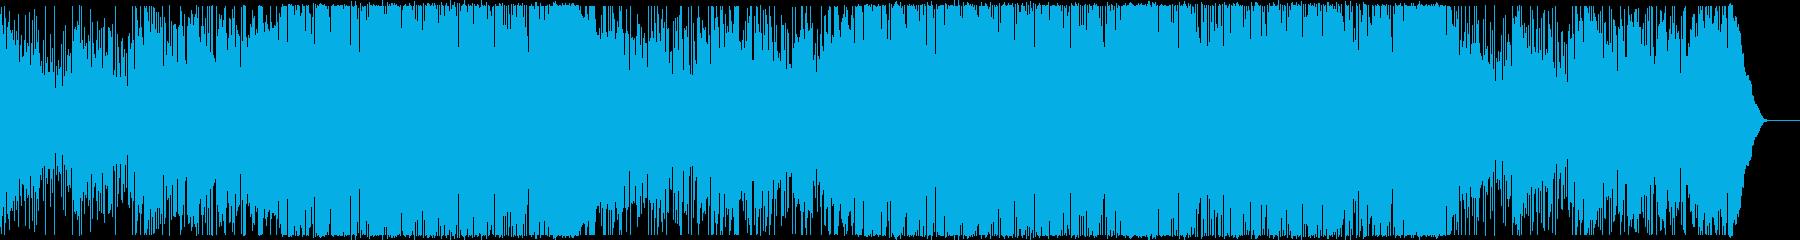 Youtube・楽しい・おしゃれ・ジャズの再生済みの波形